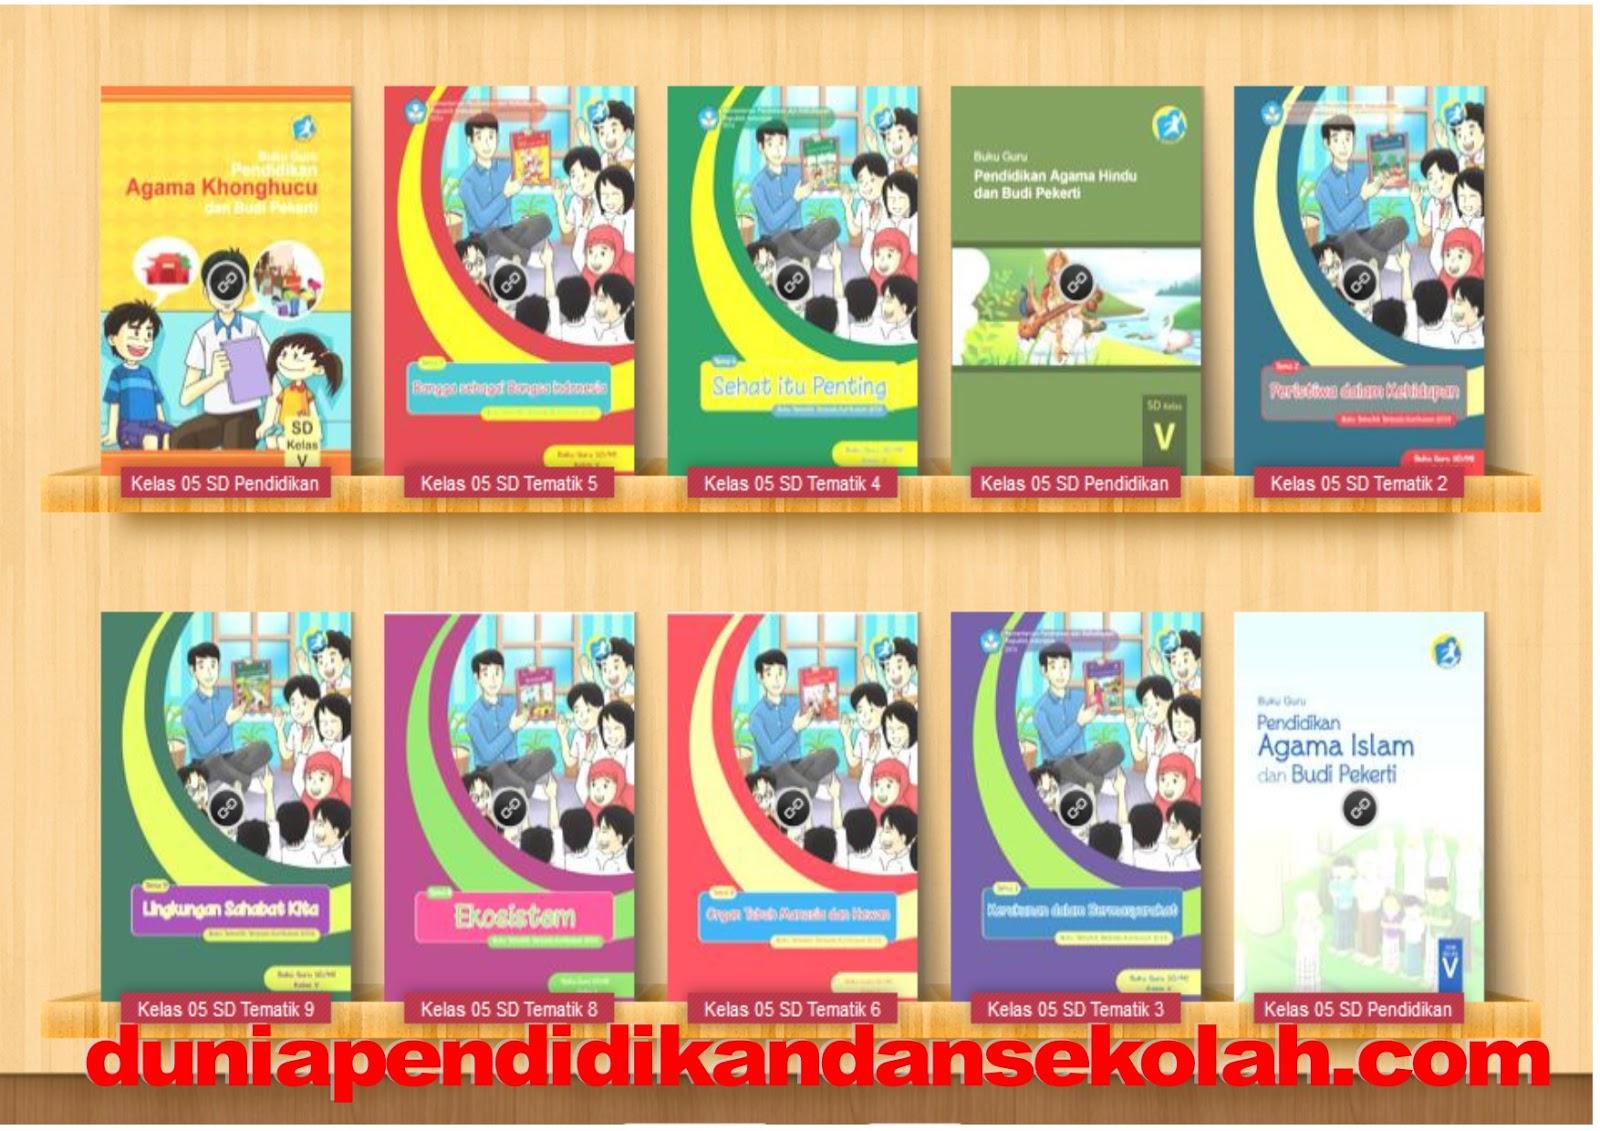 Download Contoh Soal Uts Pub Kelas 6 Semester 1 Kurikulum 2013 Revisi Lengkap Semua Mata